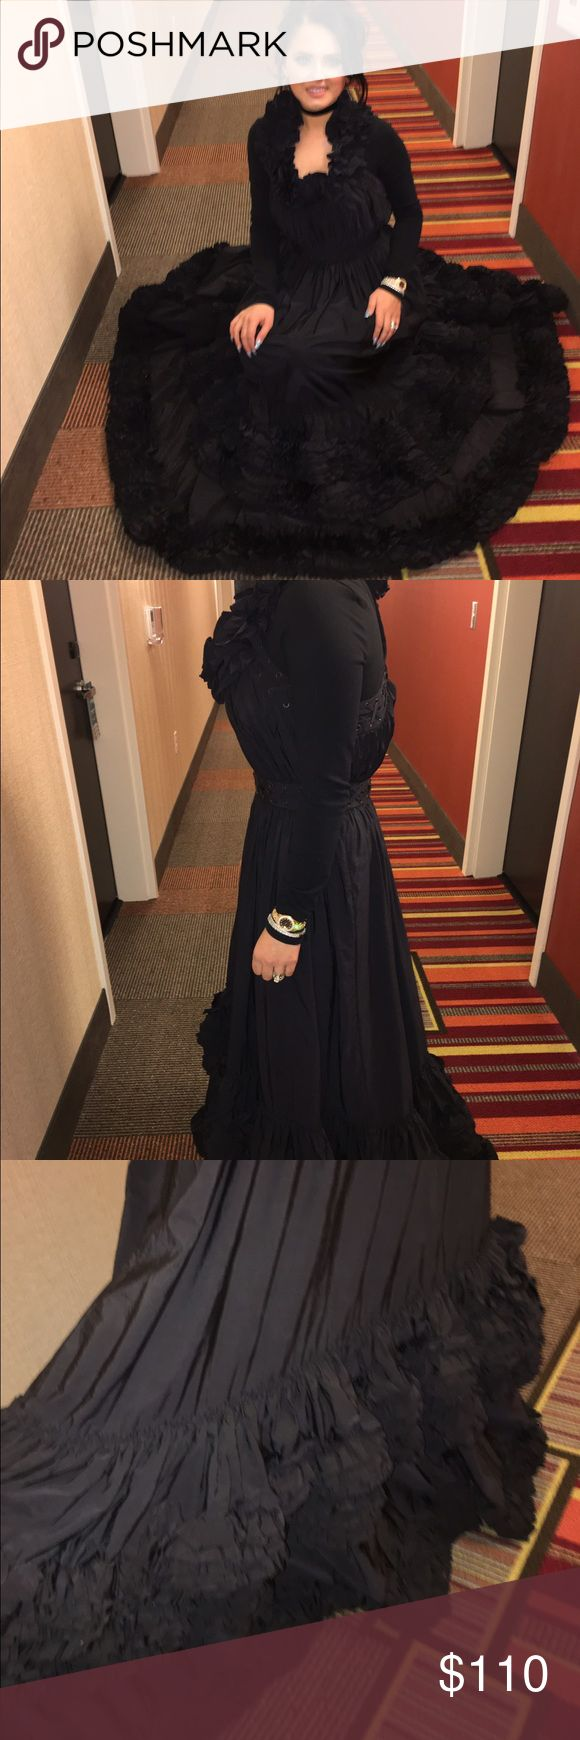 All saints long ruffle dress sz 4/6 All saints Beautiful long ruffle dress size 10 USA size 4/6 black worn one time All Saints Dresses